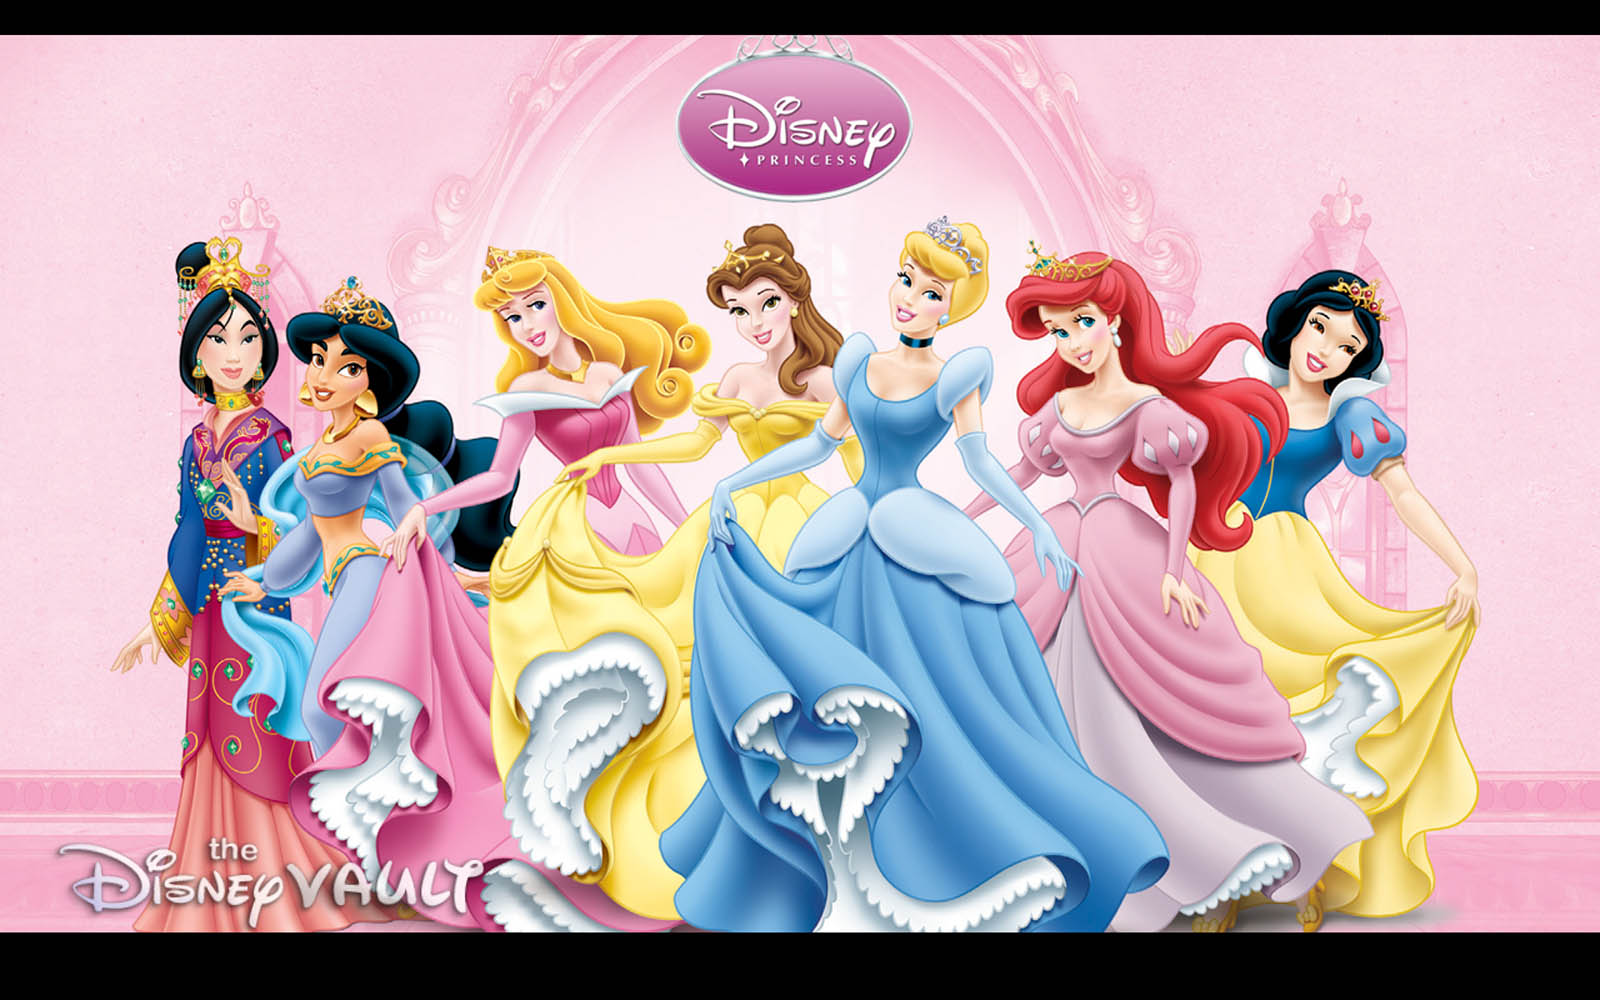 Disney Princess Wallpapers:wallpapers screensavers